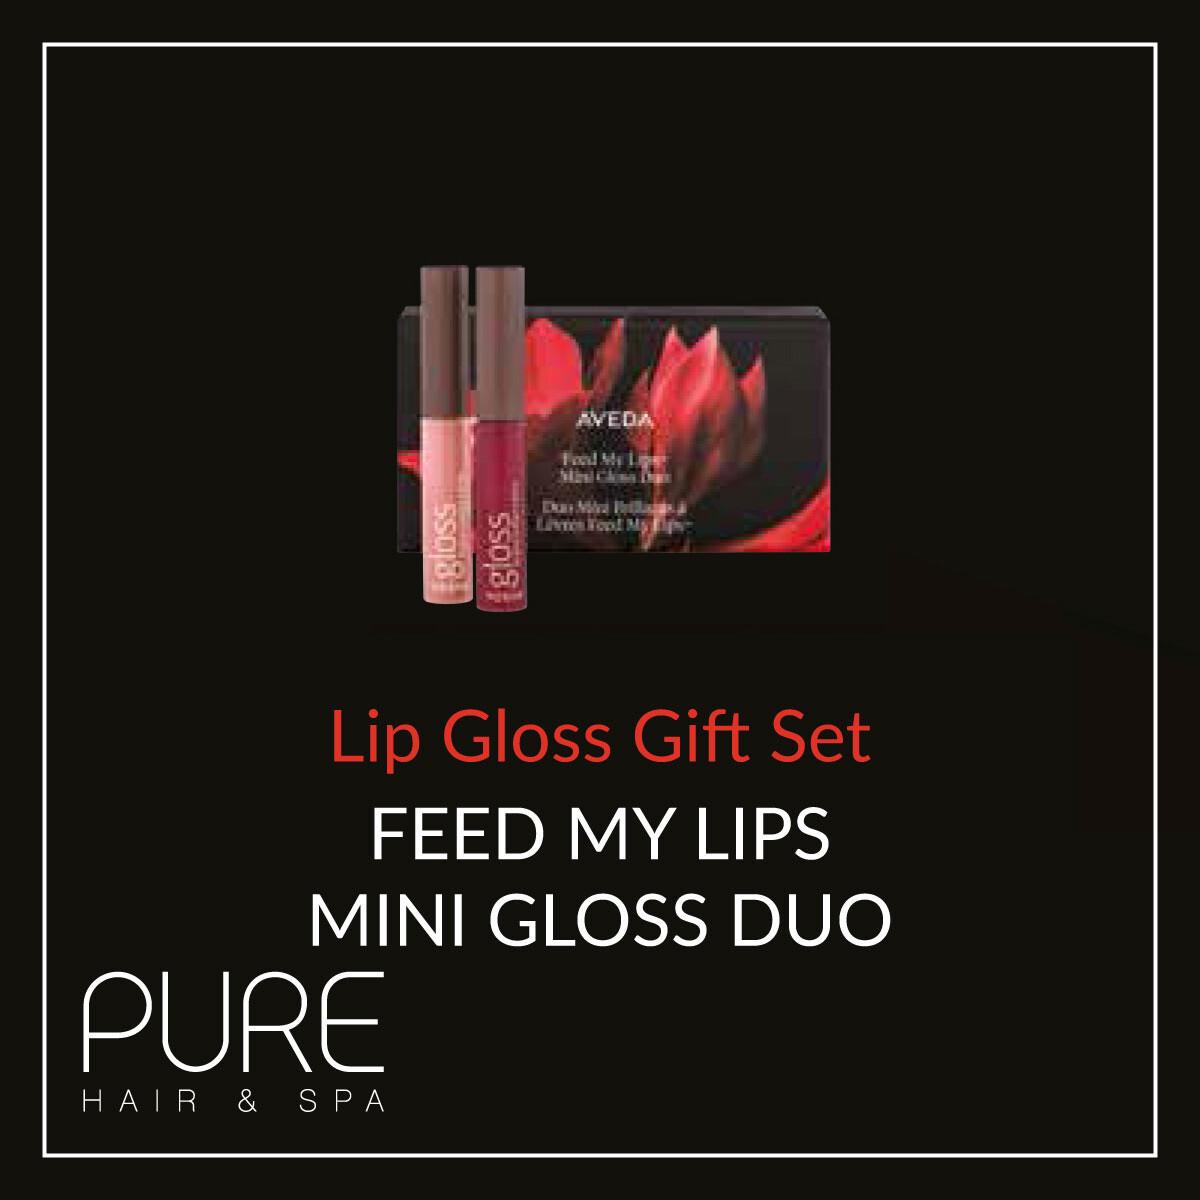 Aveda Feed My Lips Gloss Duo Gift Set.